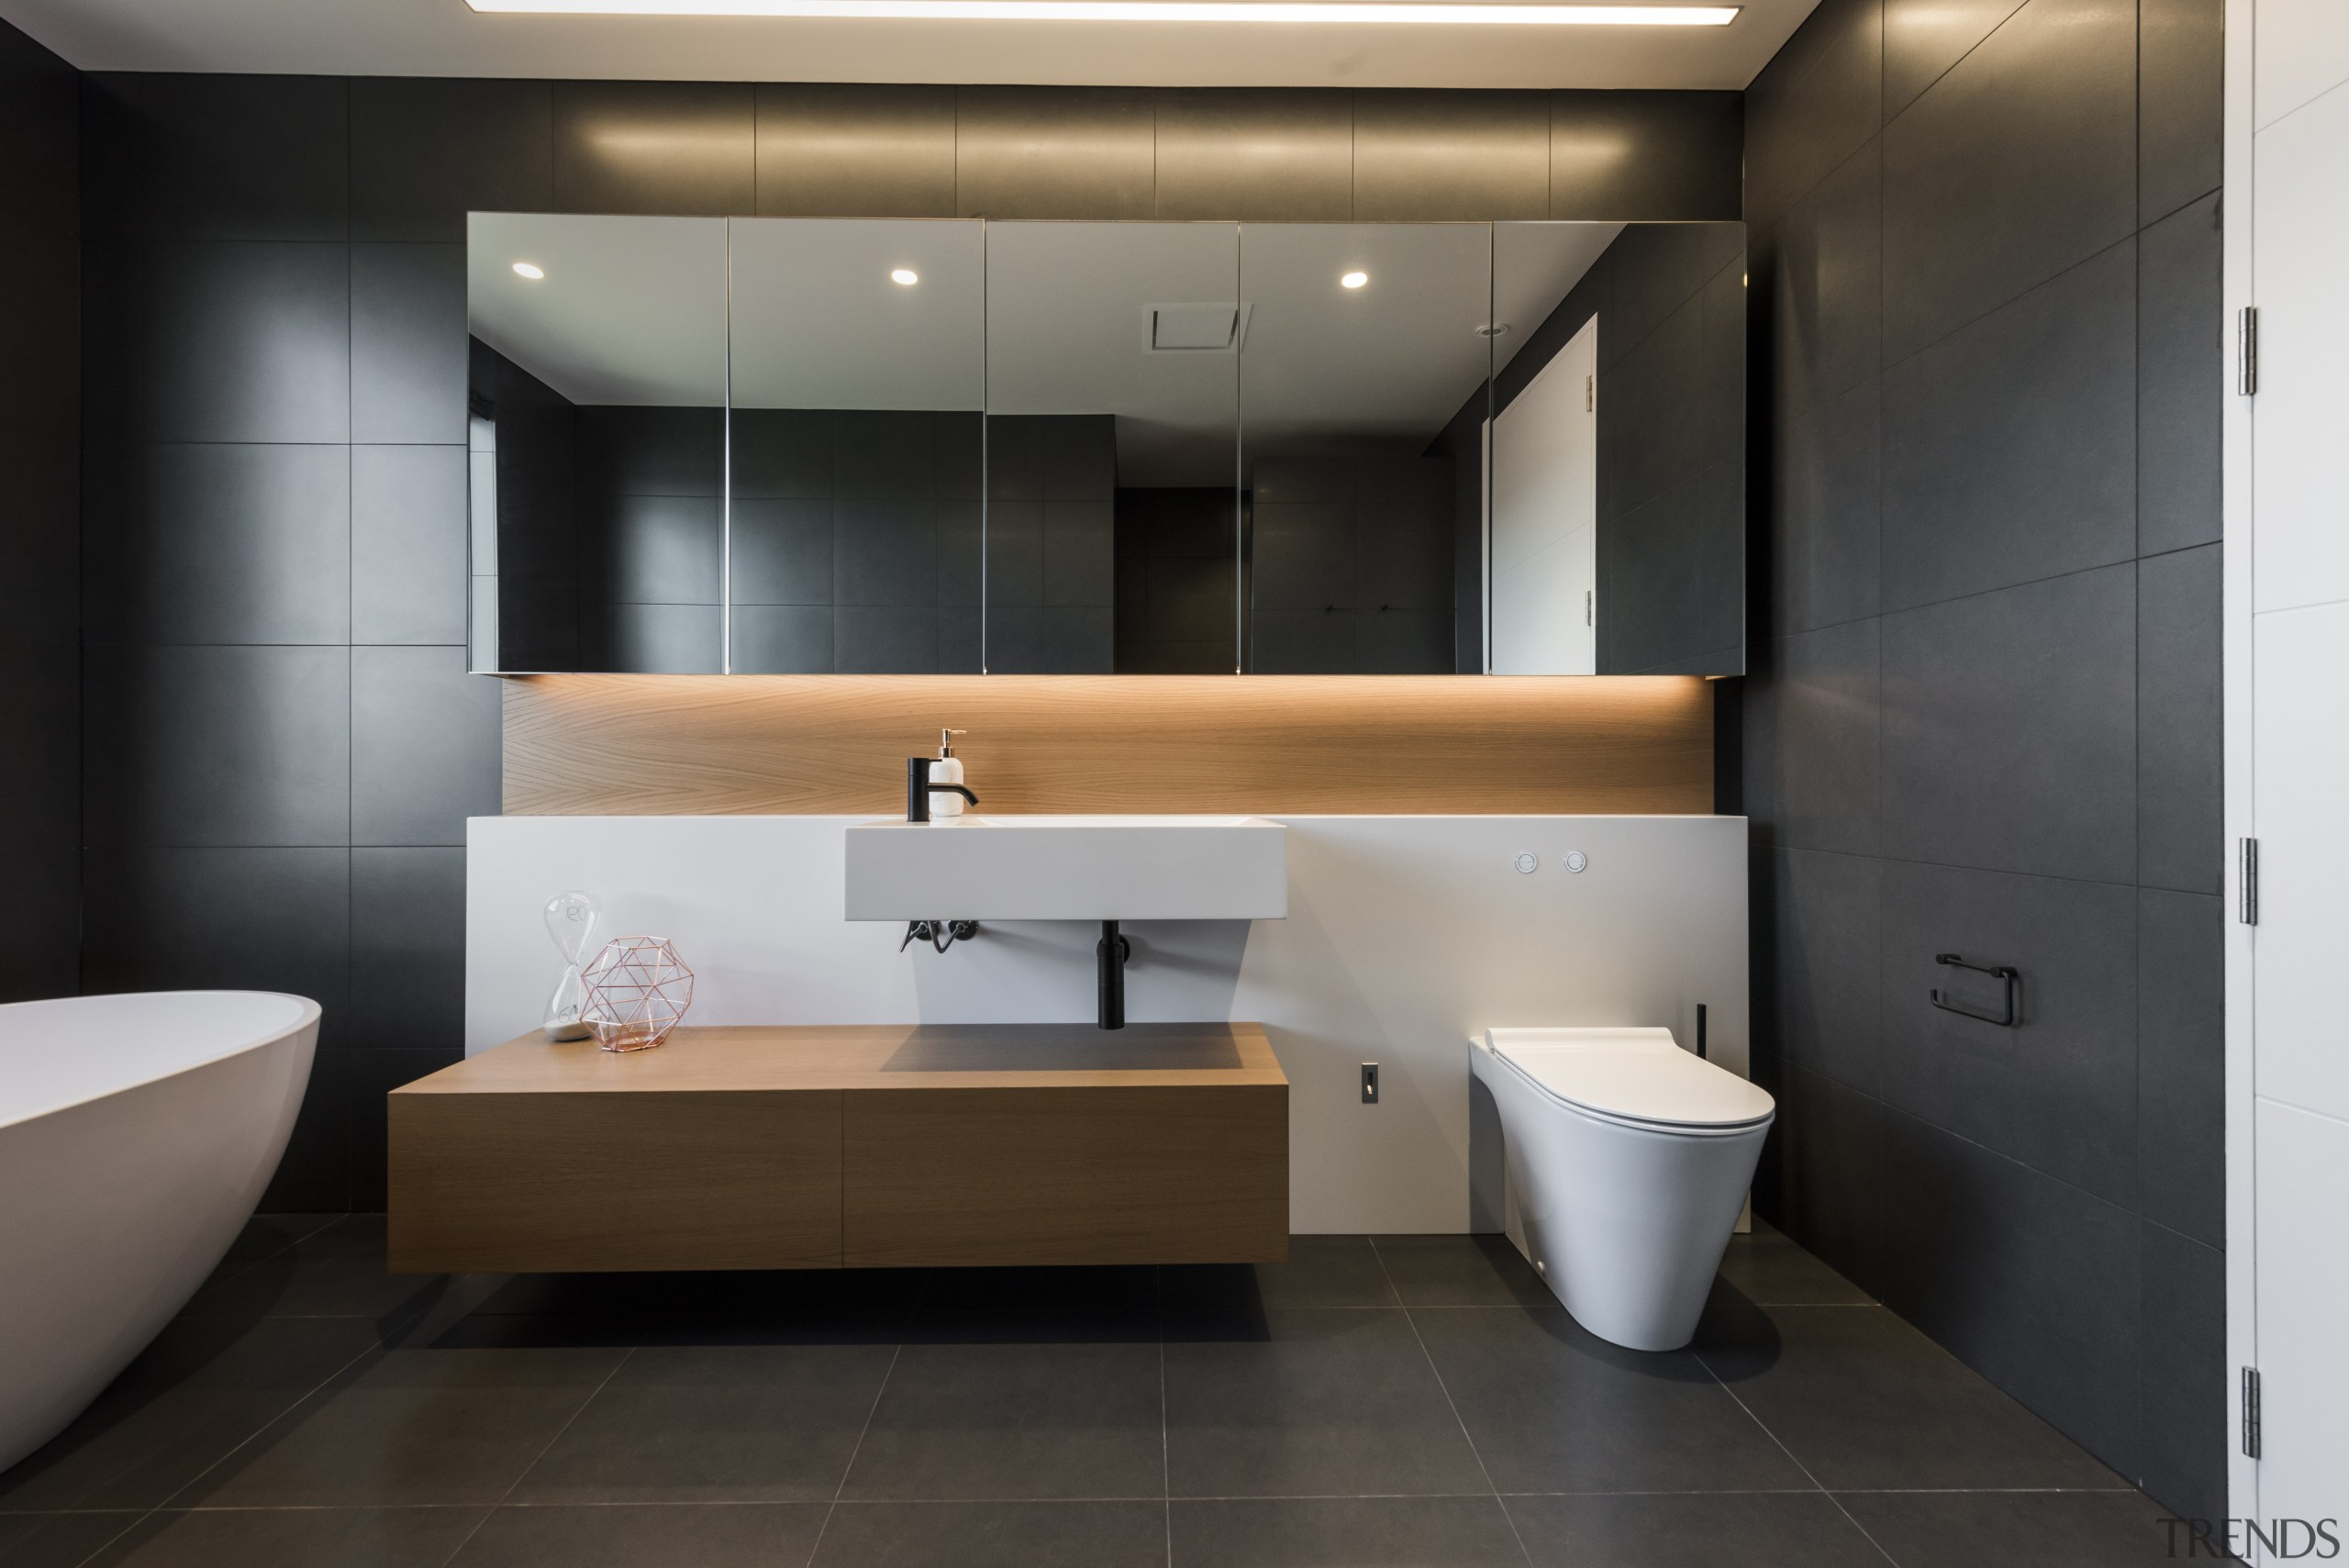 In this dramatic bathroom by professional design company bathroom, floor, flooring, interior design, black, tiles, timber vanity, Davinia Sutton